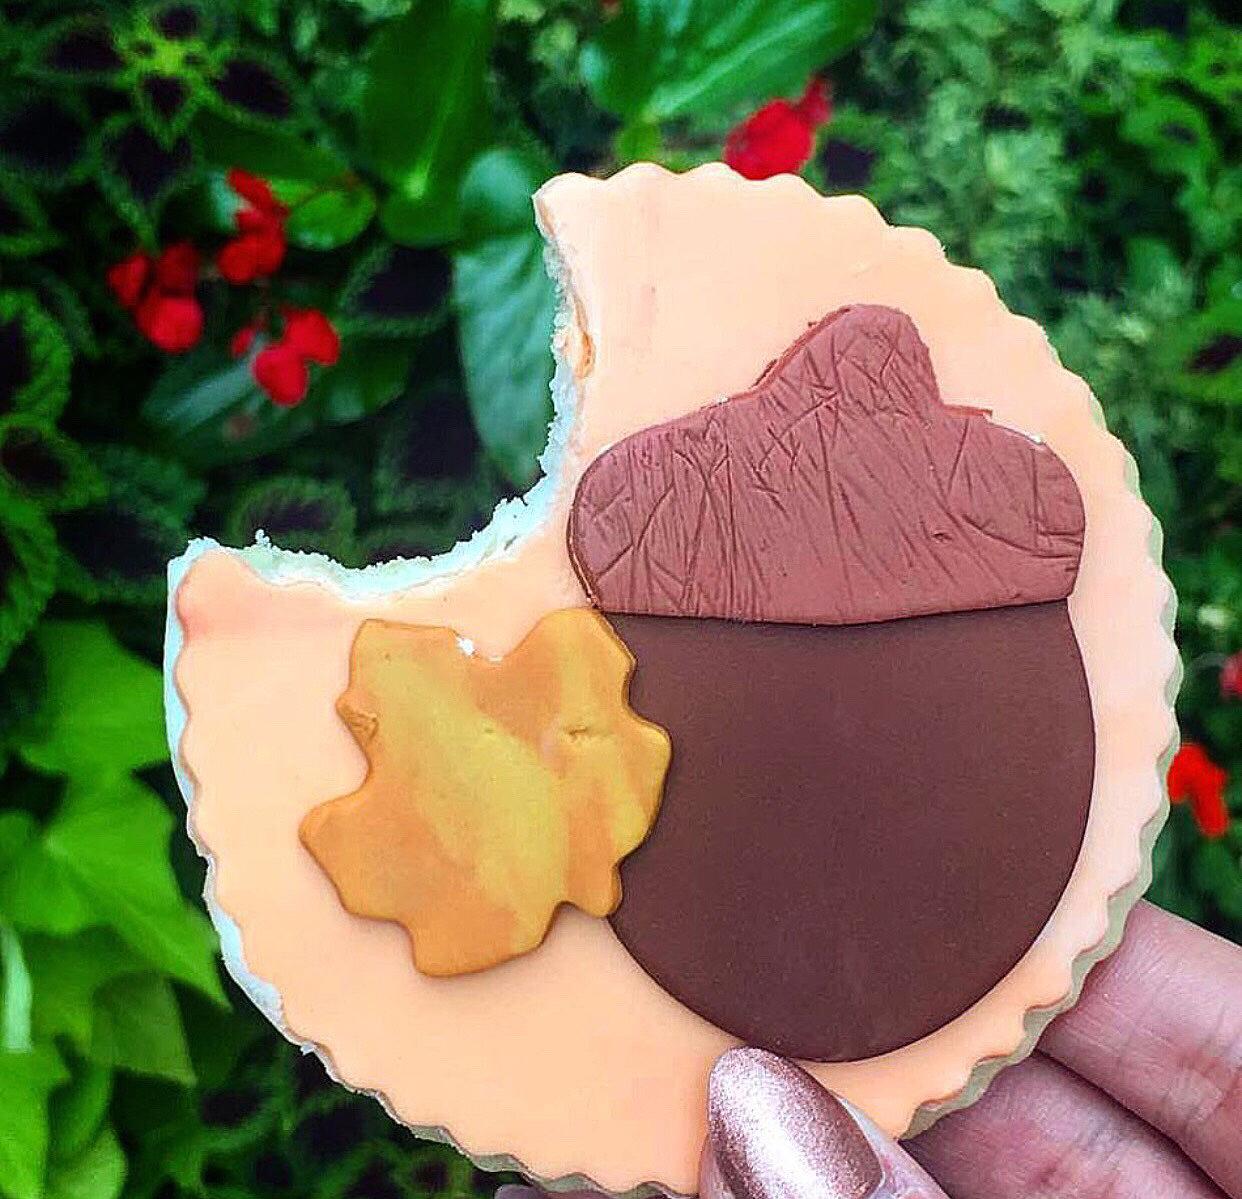 Tony_Ward_Studio_Katie_kerl_Fall_fun_guide_cookies